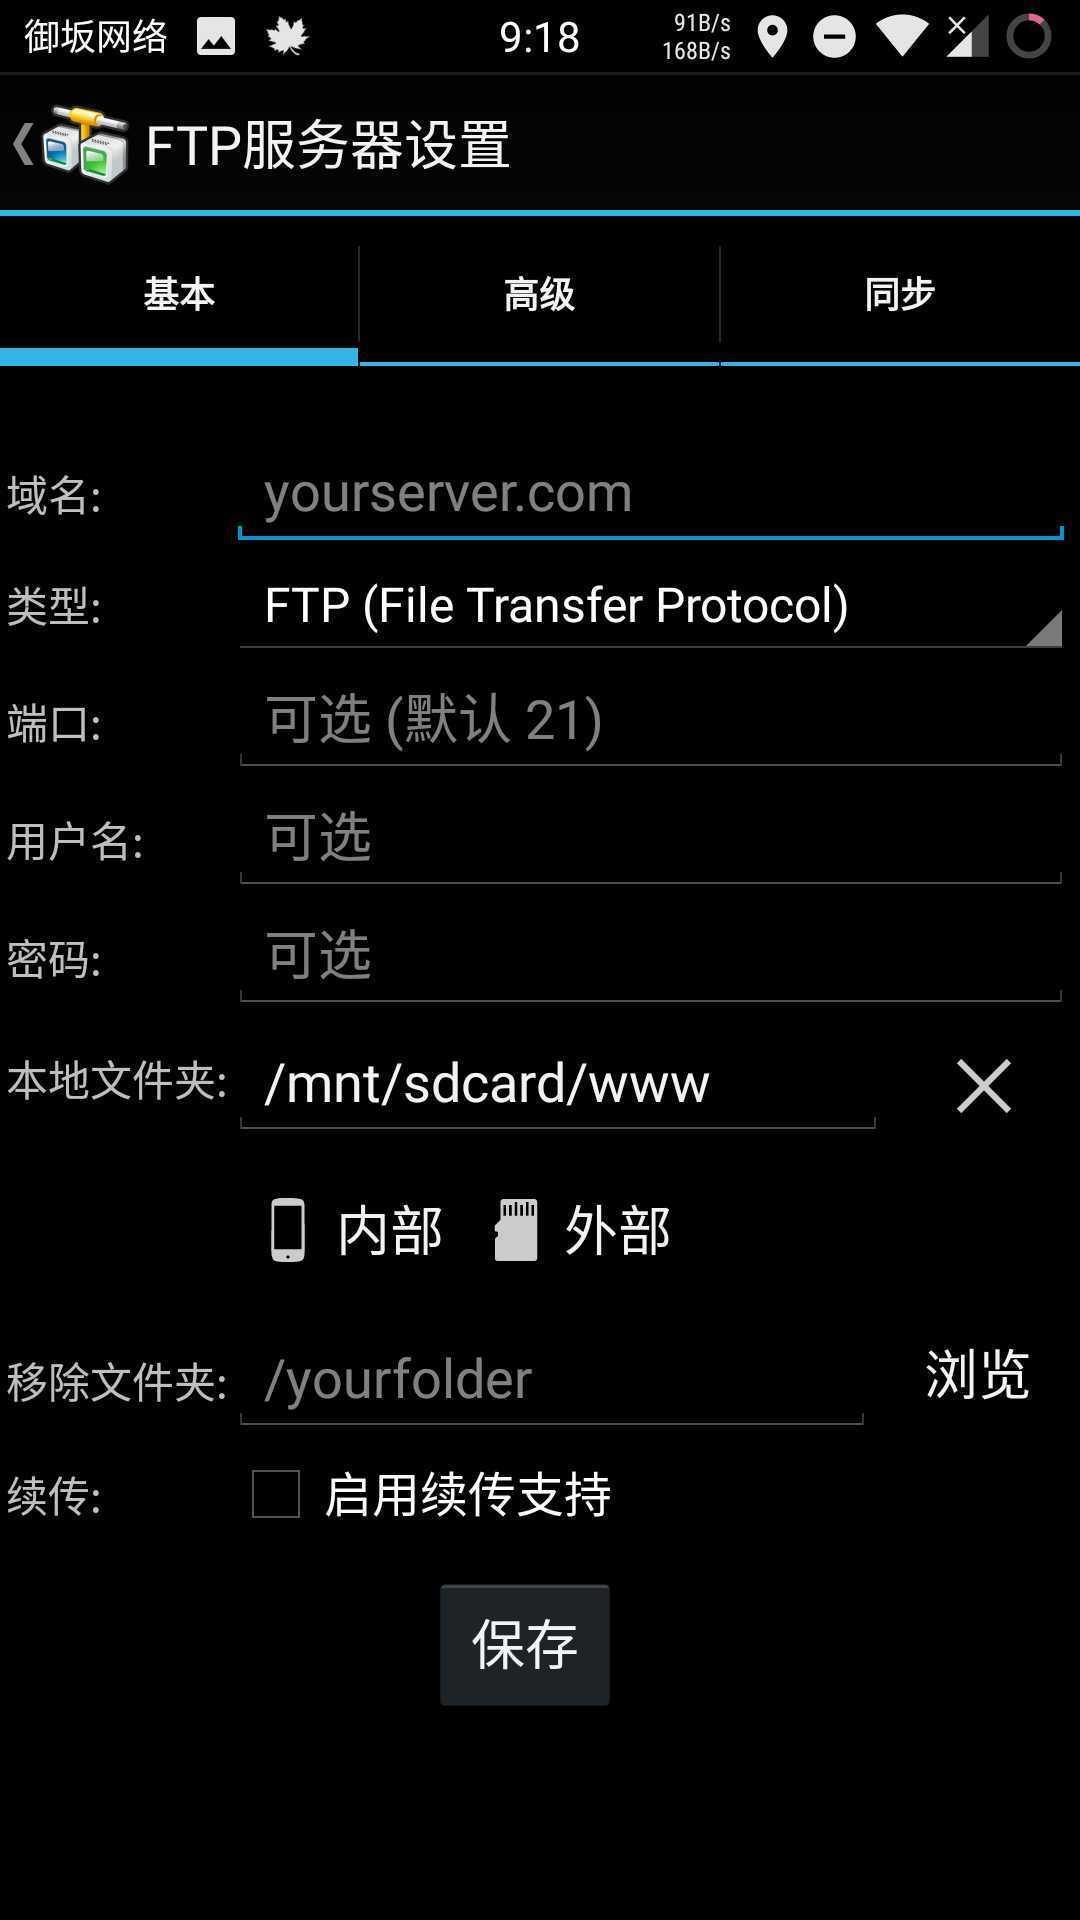 andftp pro v.4 专业版